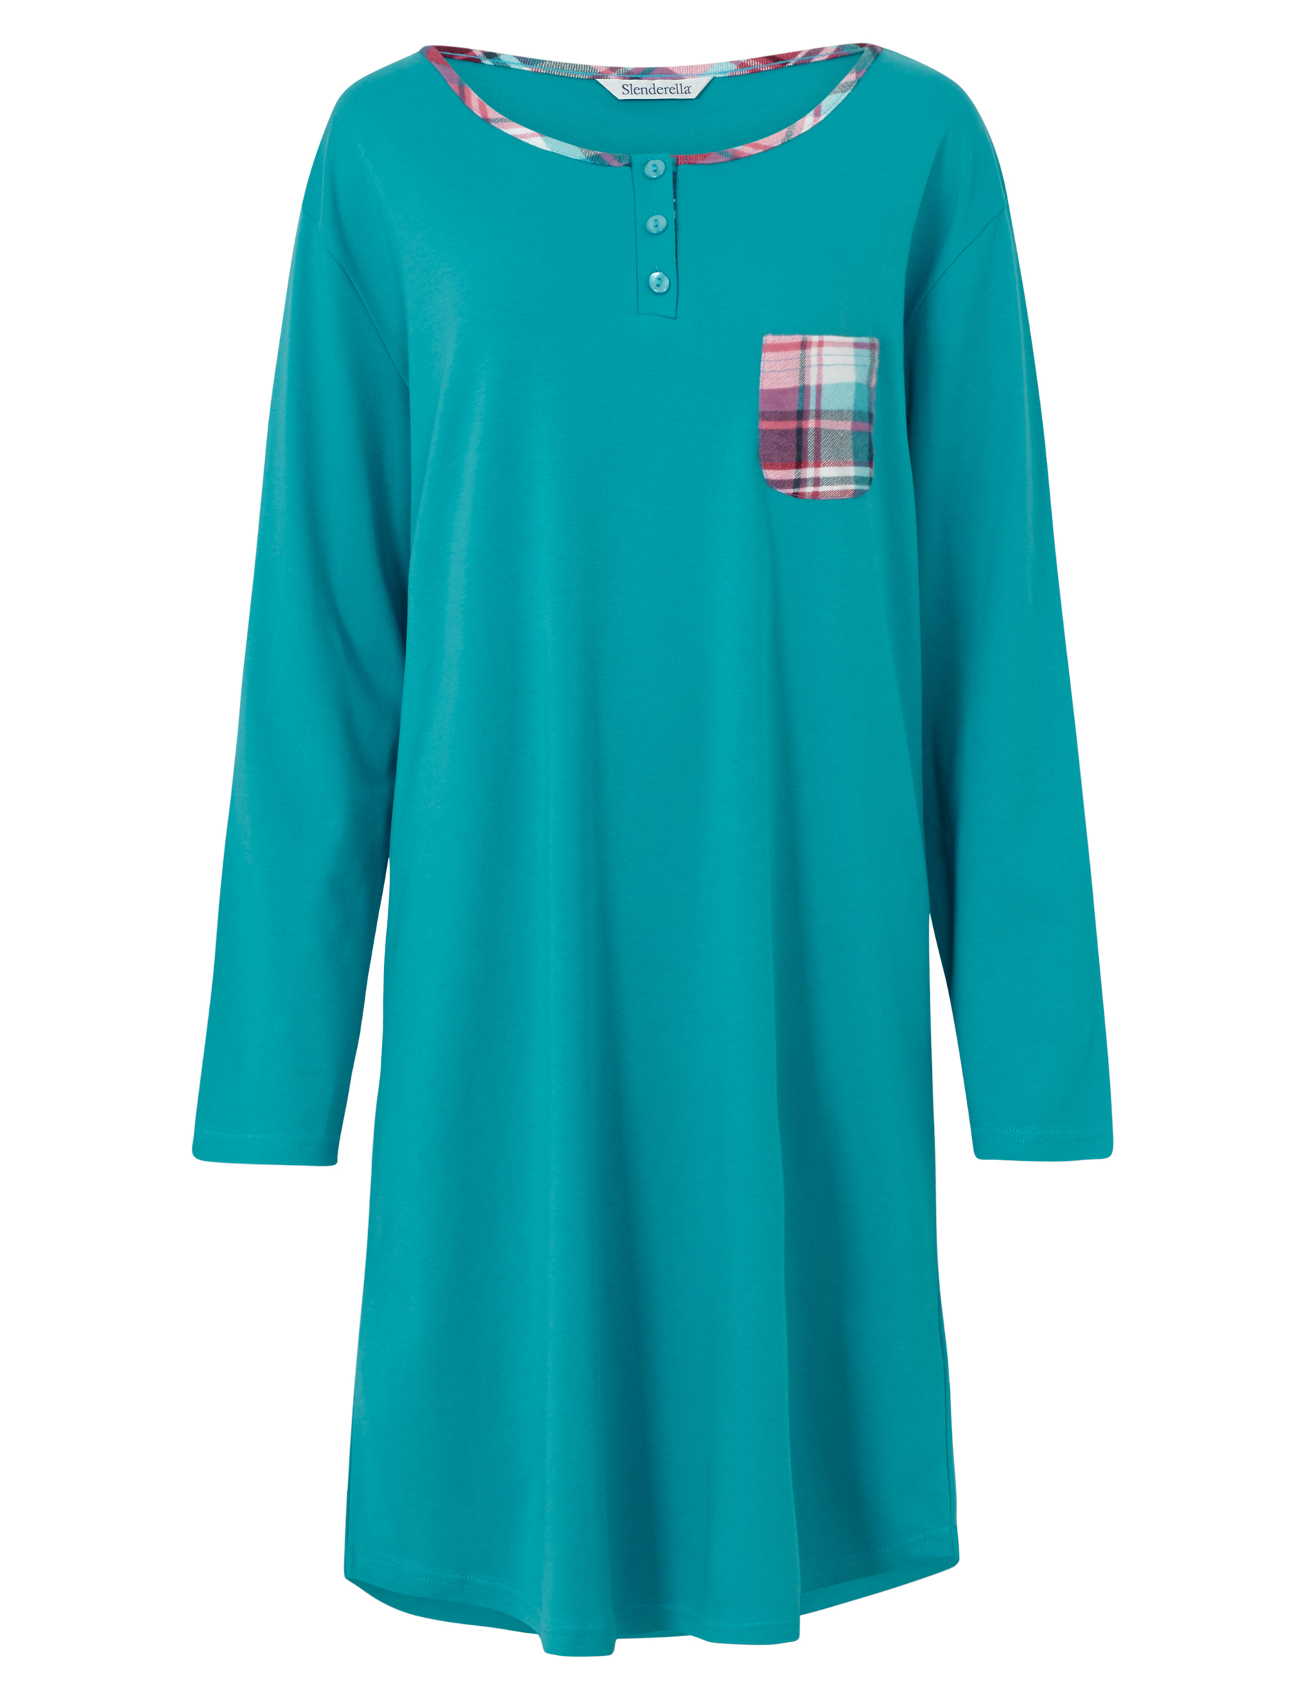 Slenderella Nightdress Nightshirt Or Pyjamas 100 Cotton